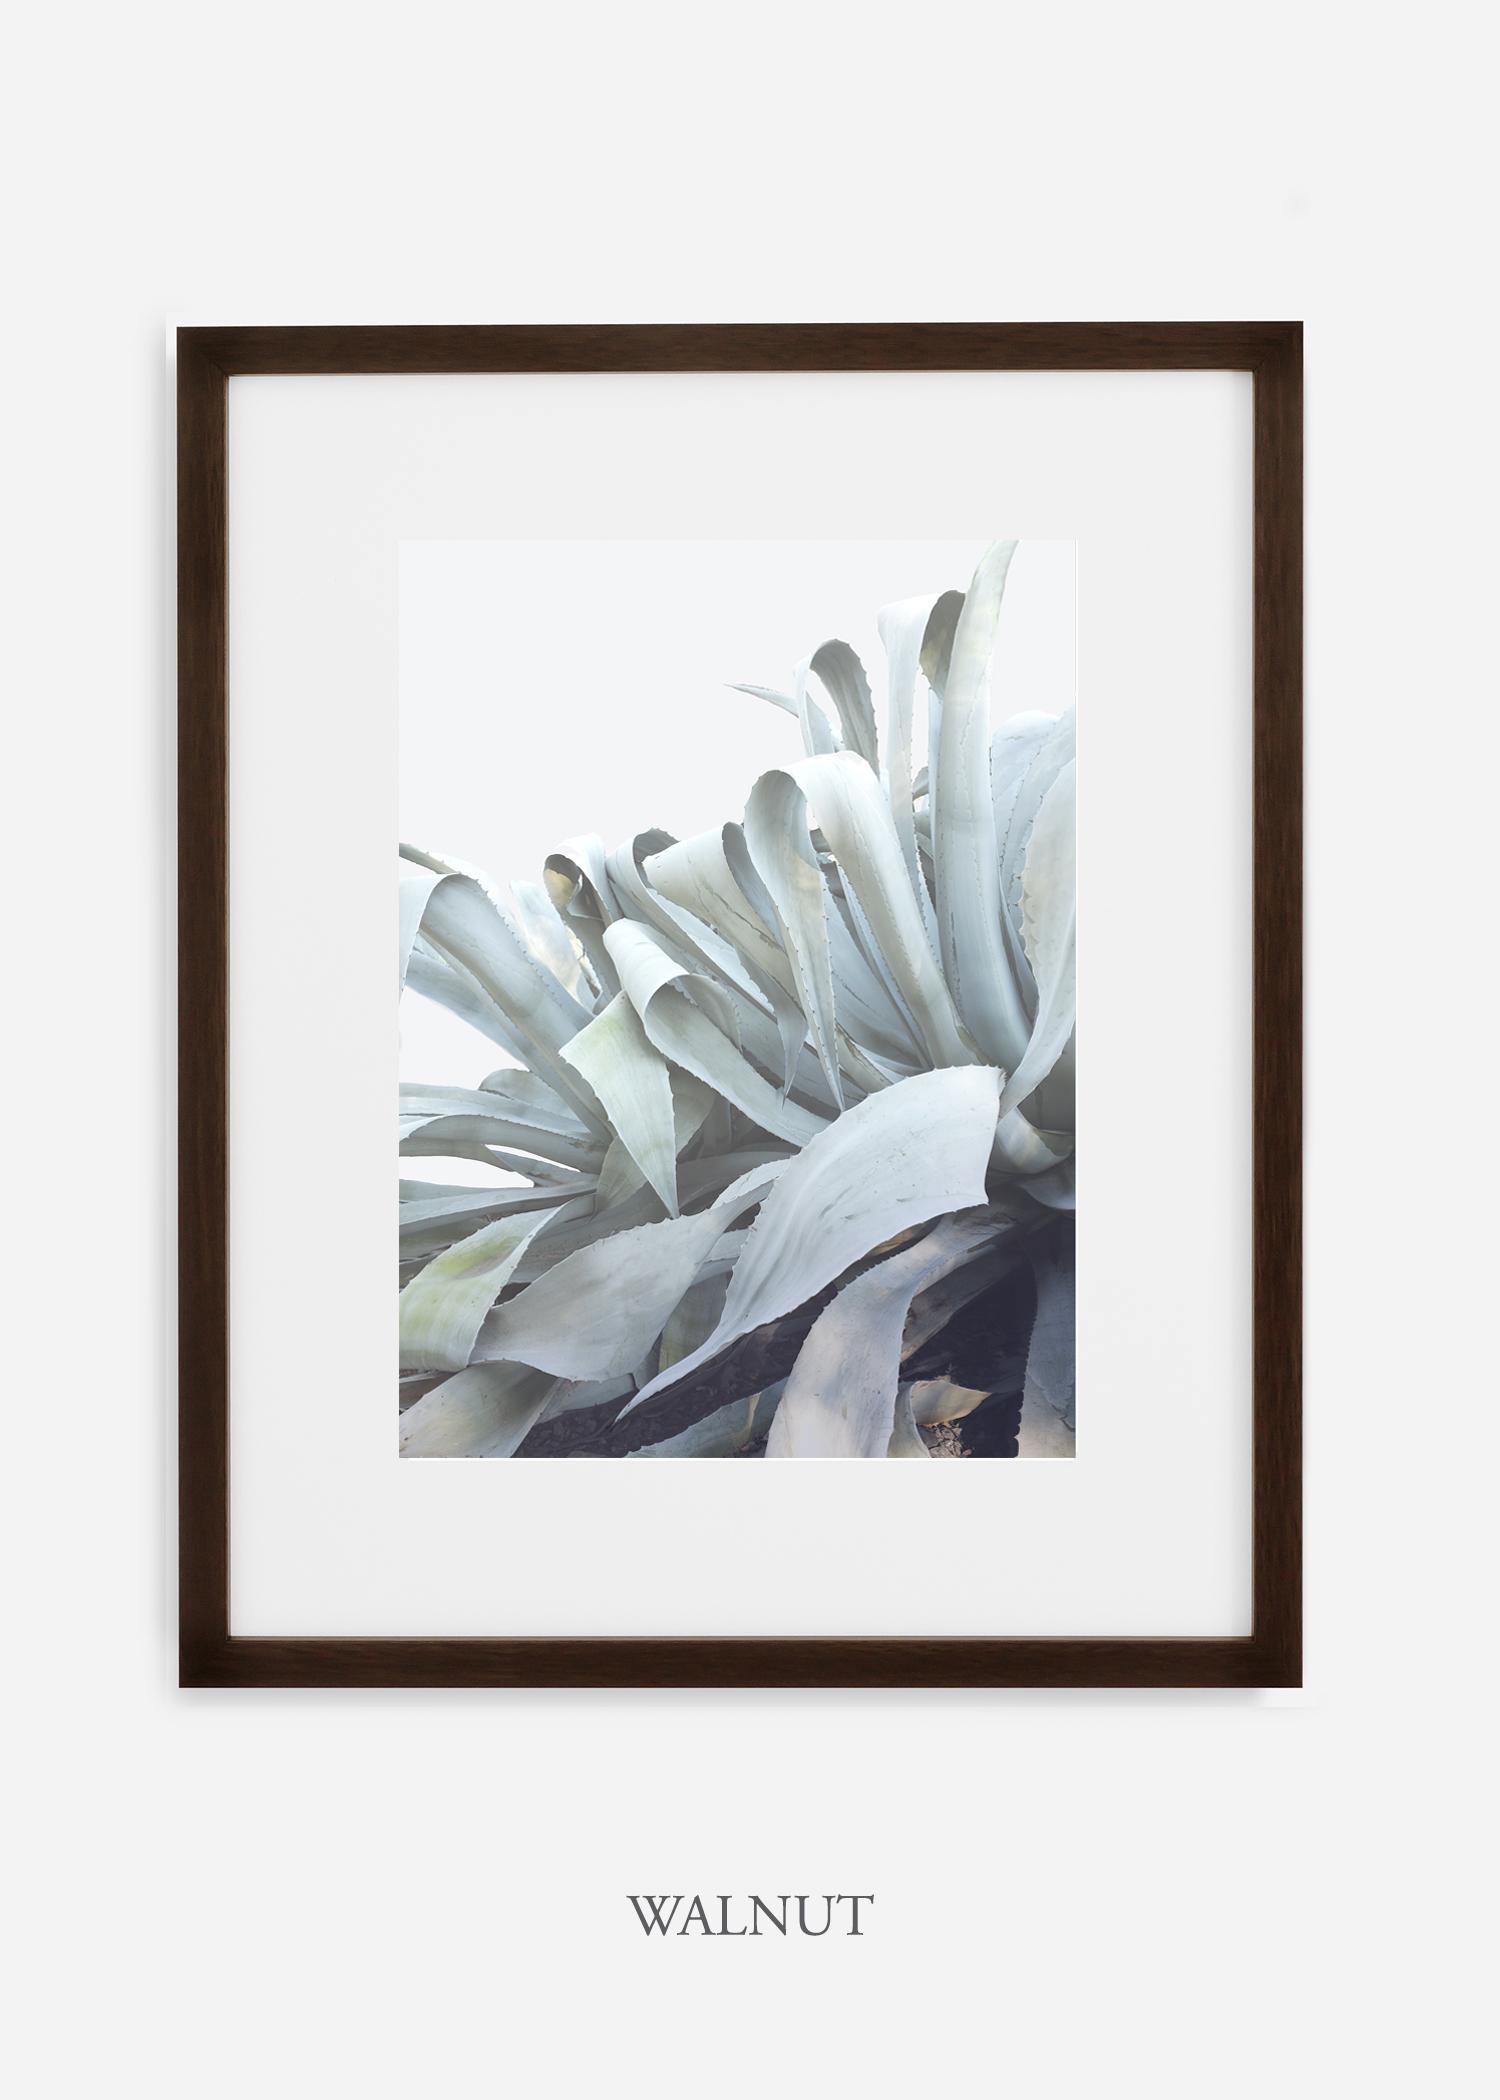 wildercalifornia_walnutframe_WinterWhite_AgaveNo.2_Desert_LosAngeles_Art_HomeDecor_interiordesign_design.jpg